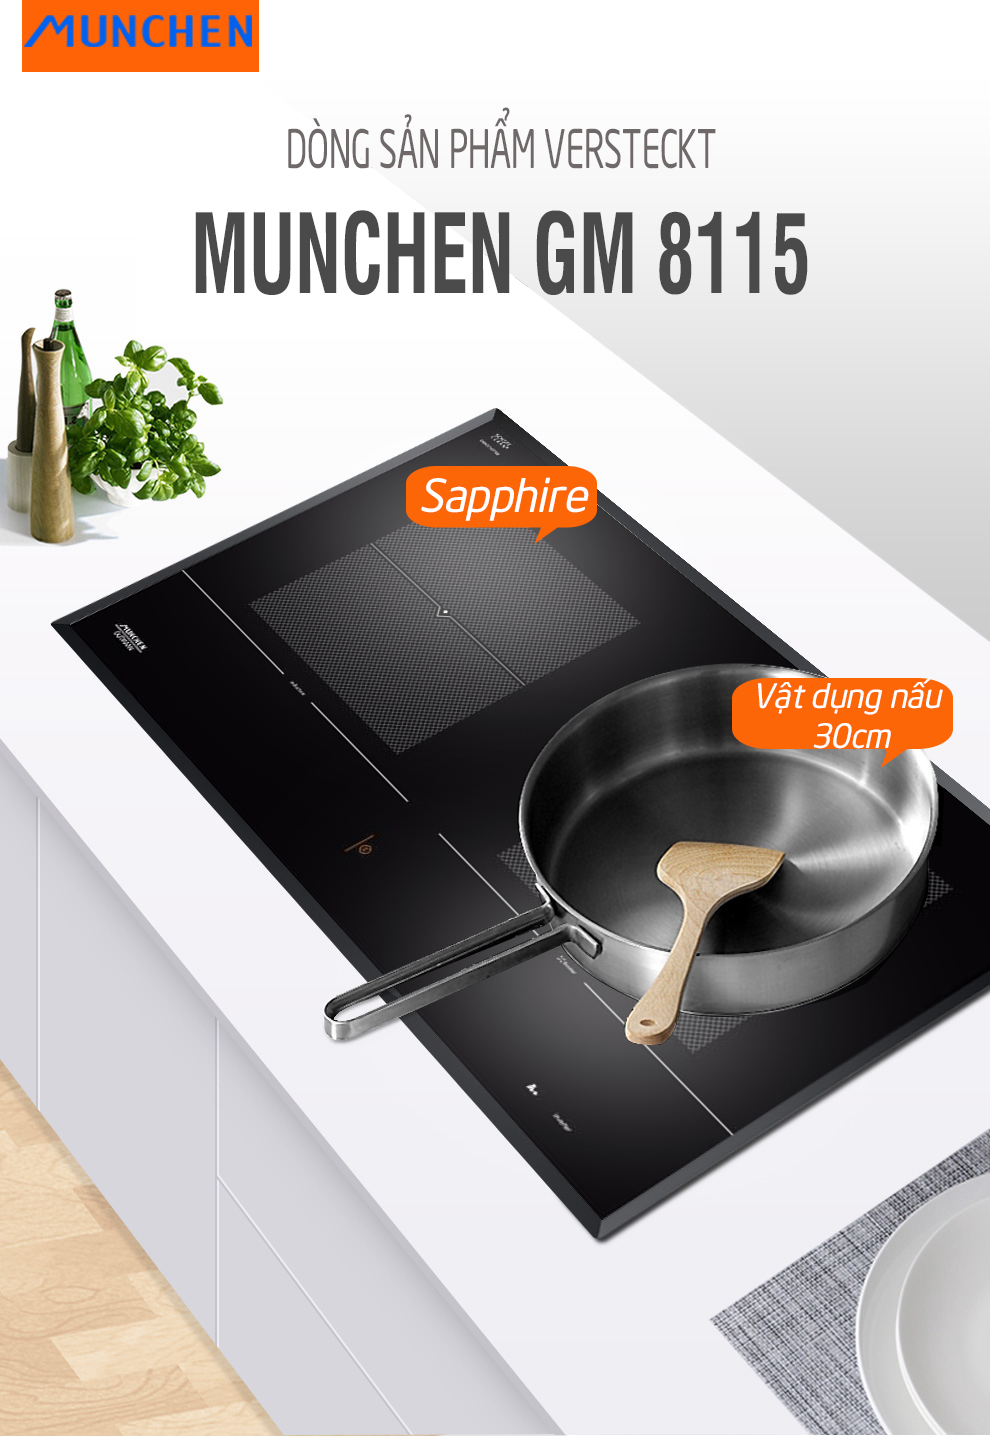 Bếp từ Munchen GM8115 giao diện đẹp